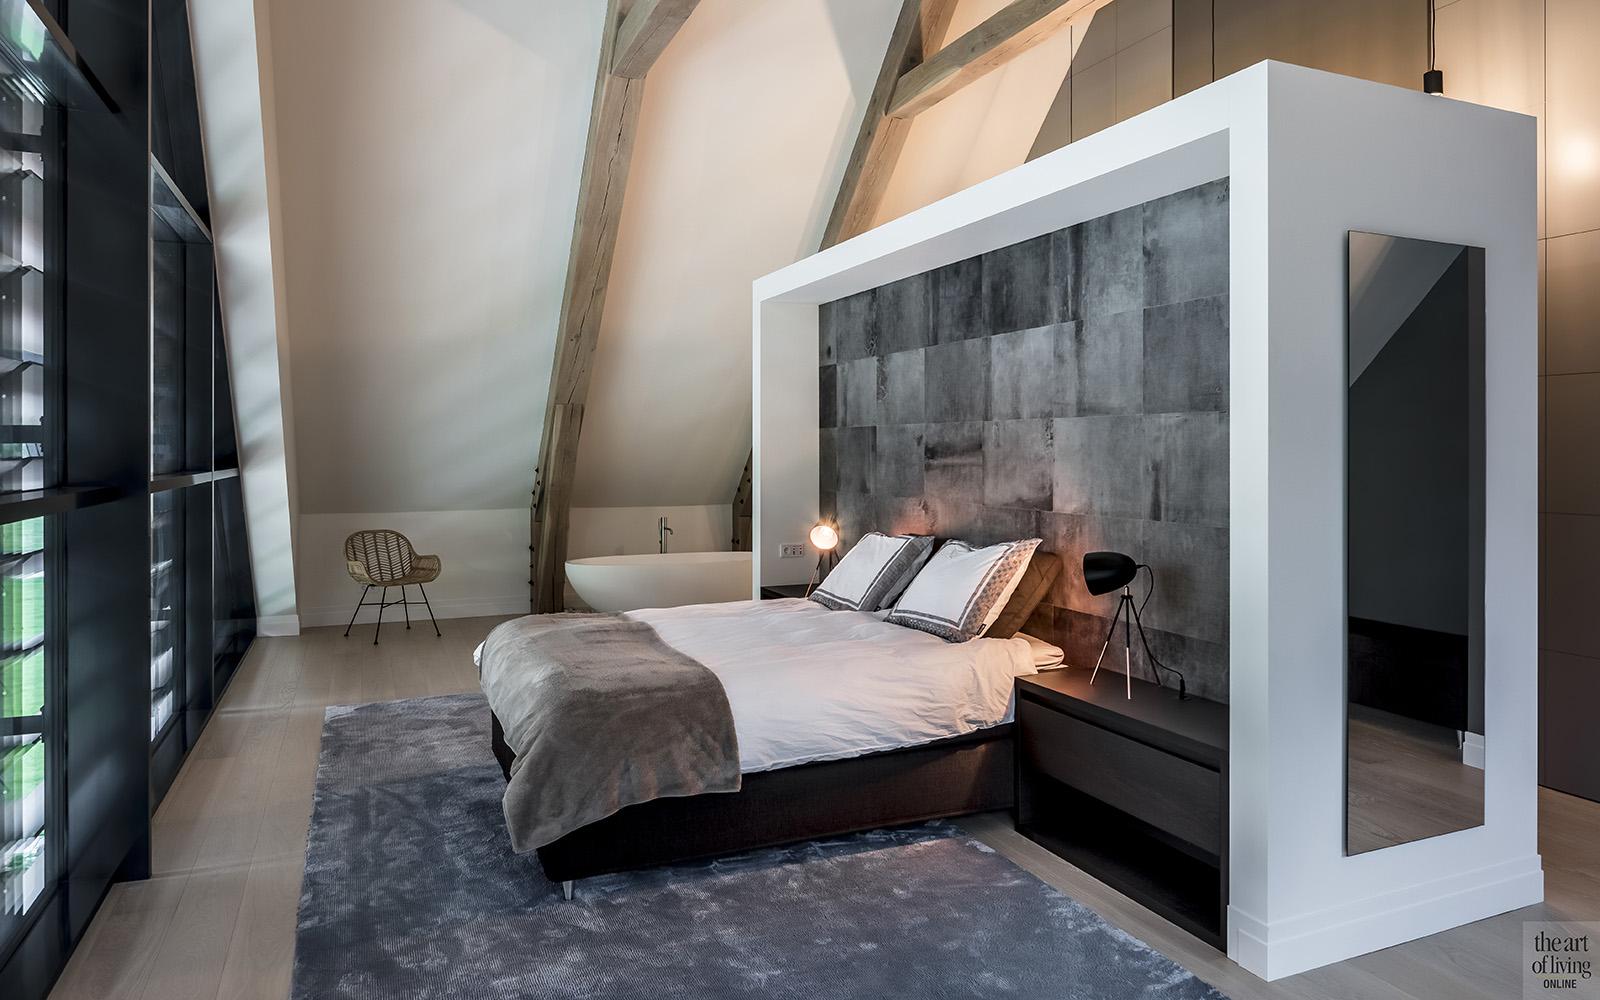 Design interieur, stephen versteegh, the art of living